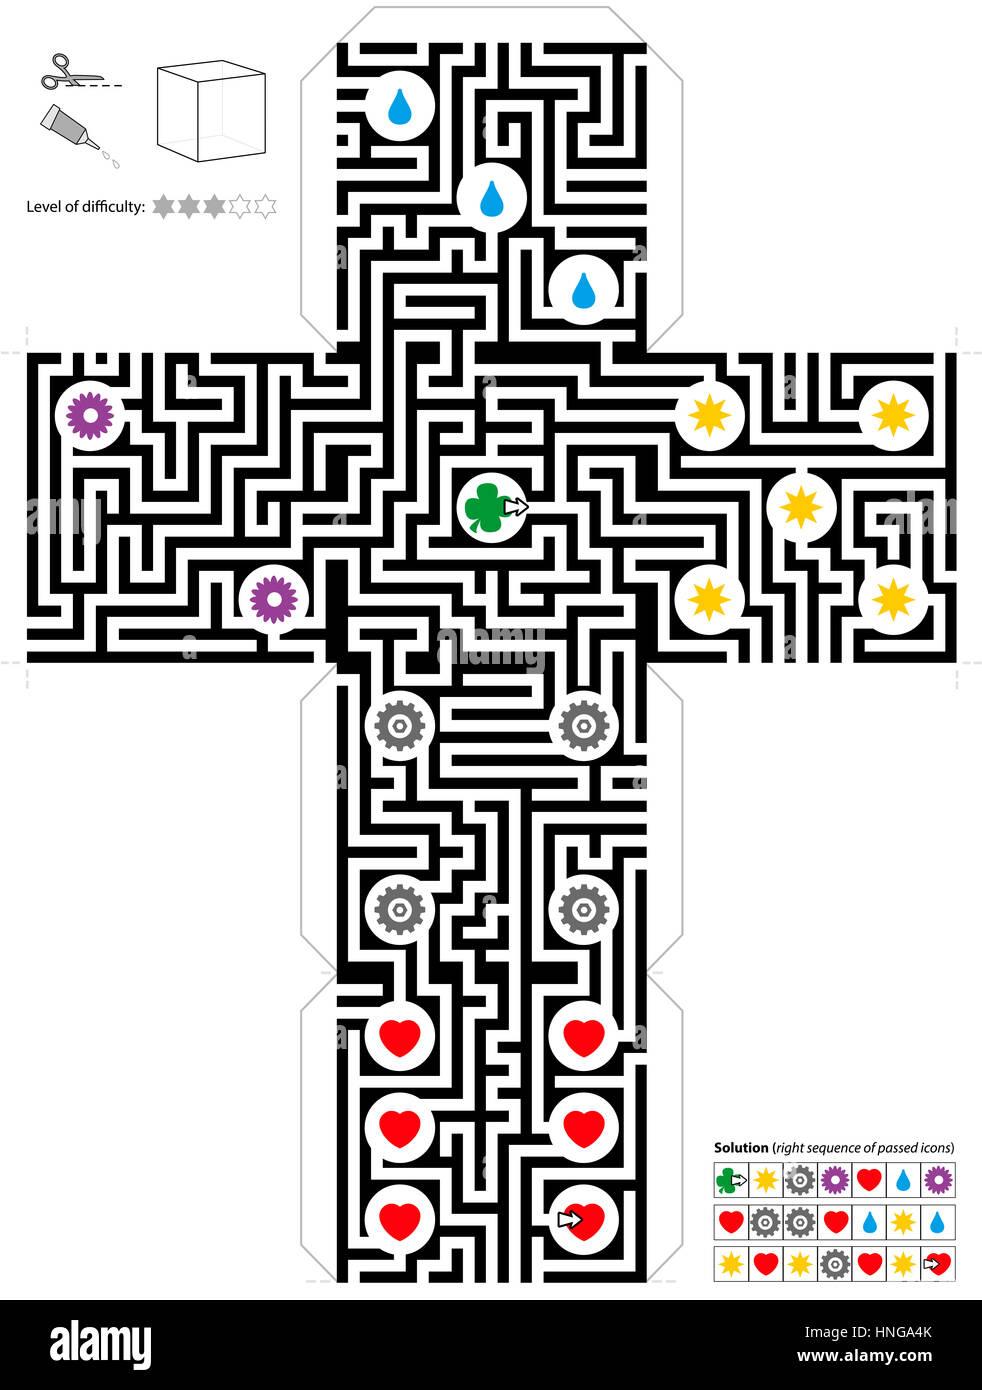 Plantilla cubo laberinto Foto & Imagen De Stock: 133739555 - Alamy